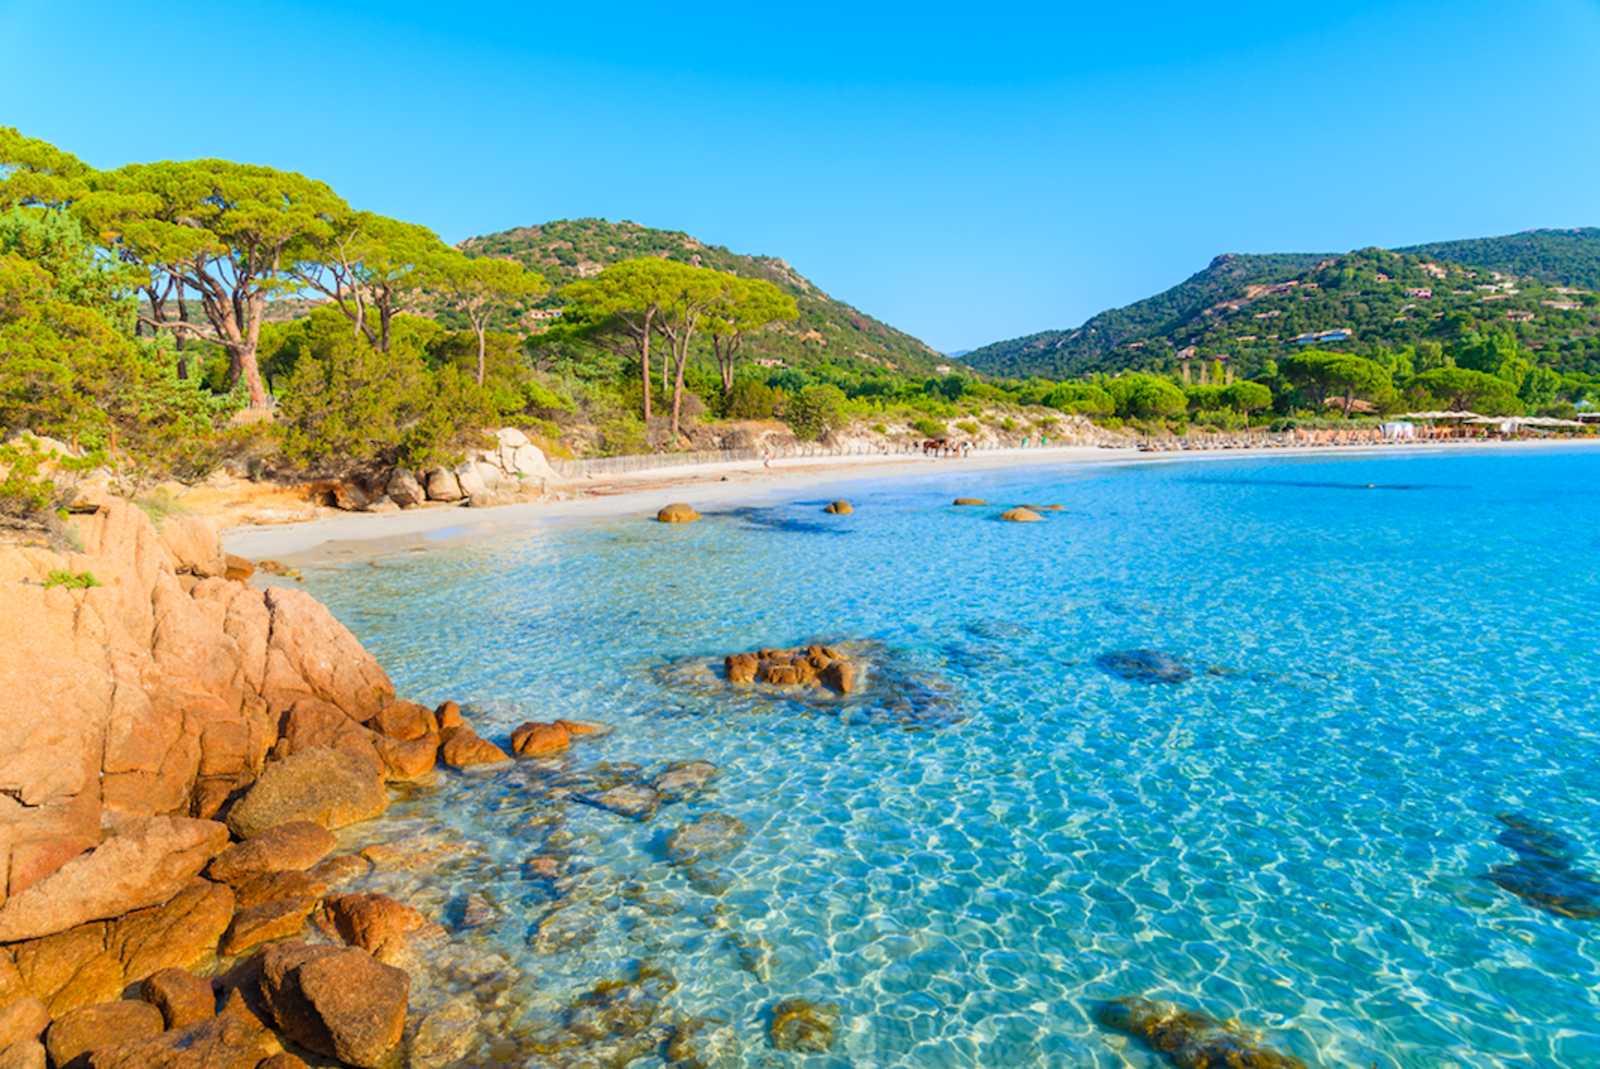 Plage de Palombaggia Korsika Frankreich Strand